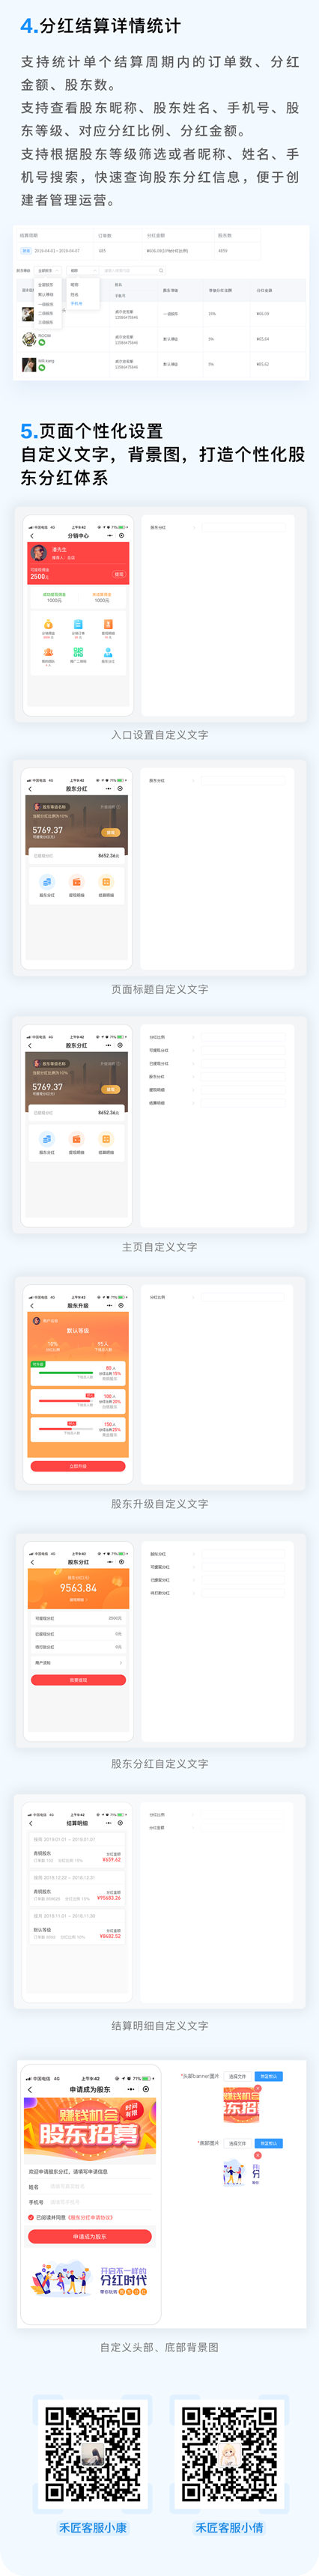 股东分红_03.png